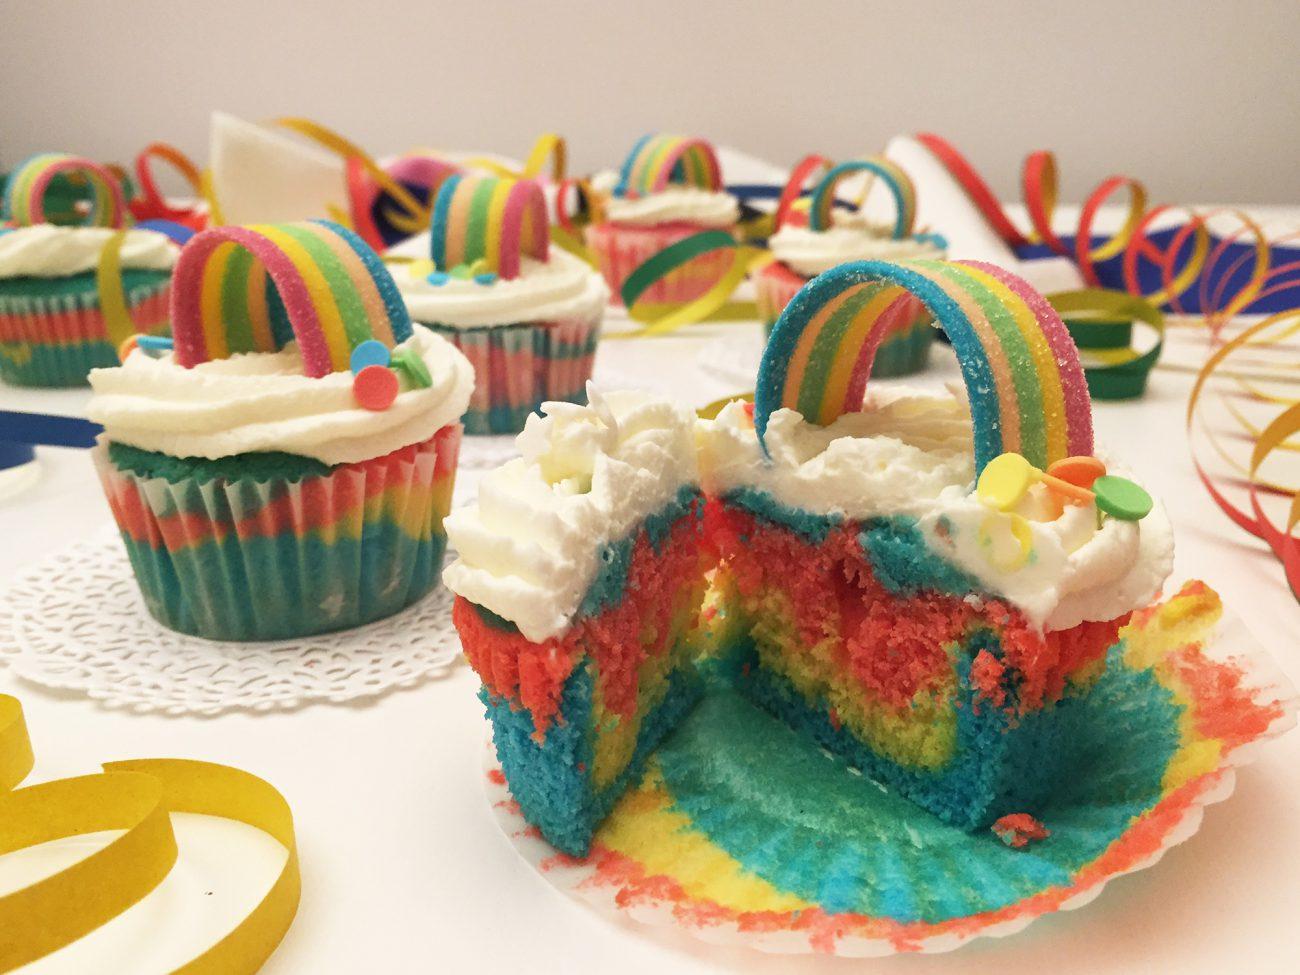 Cupcake arcobaleno con frosting al philadelphia